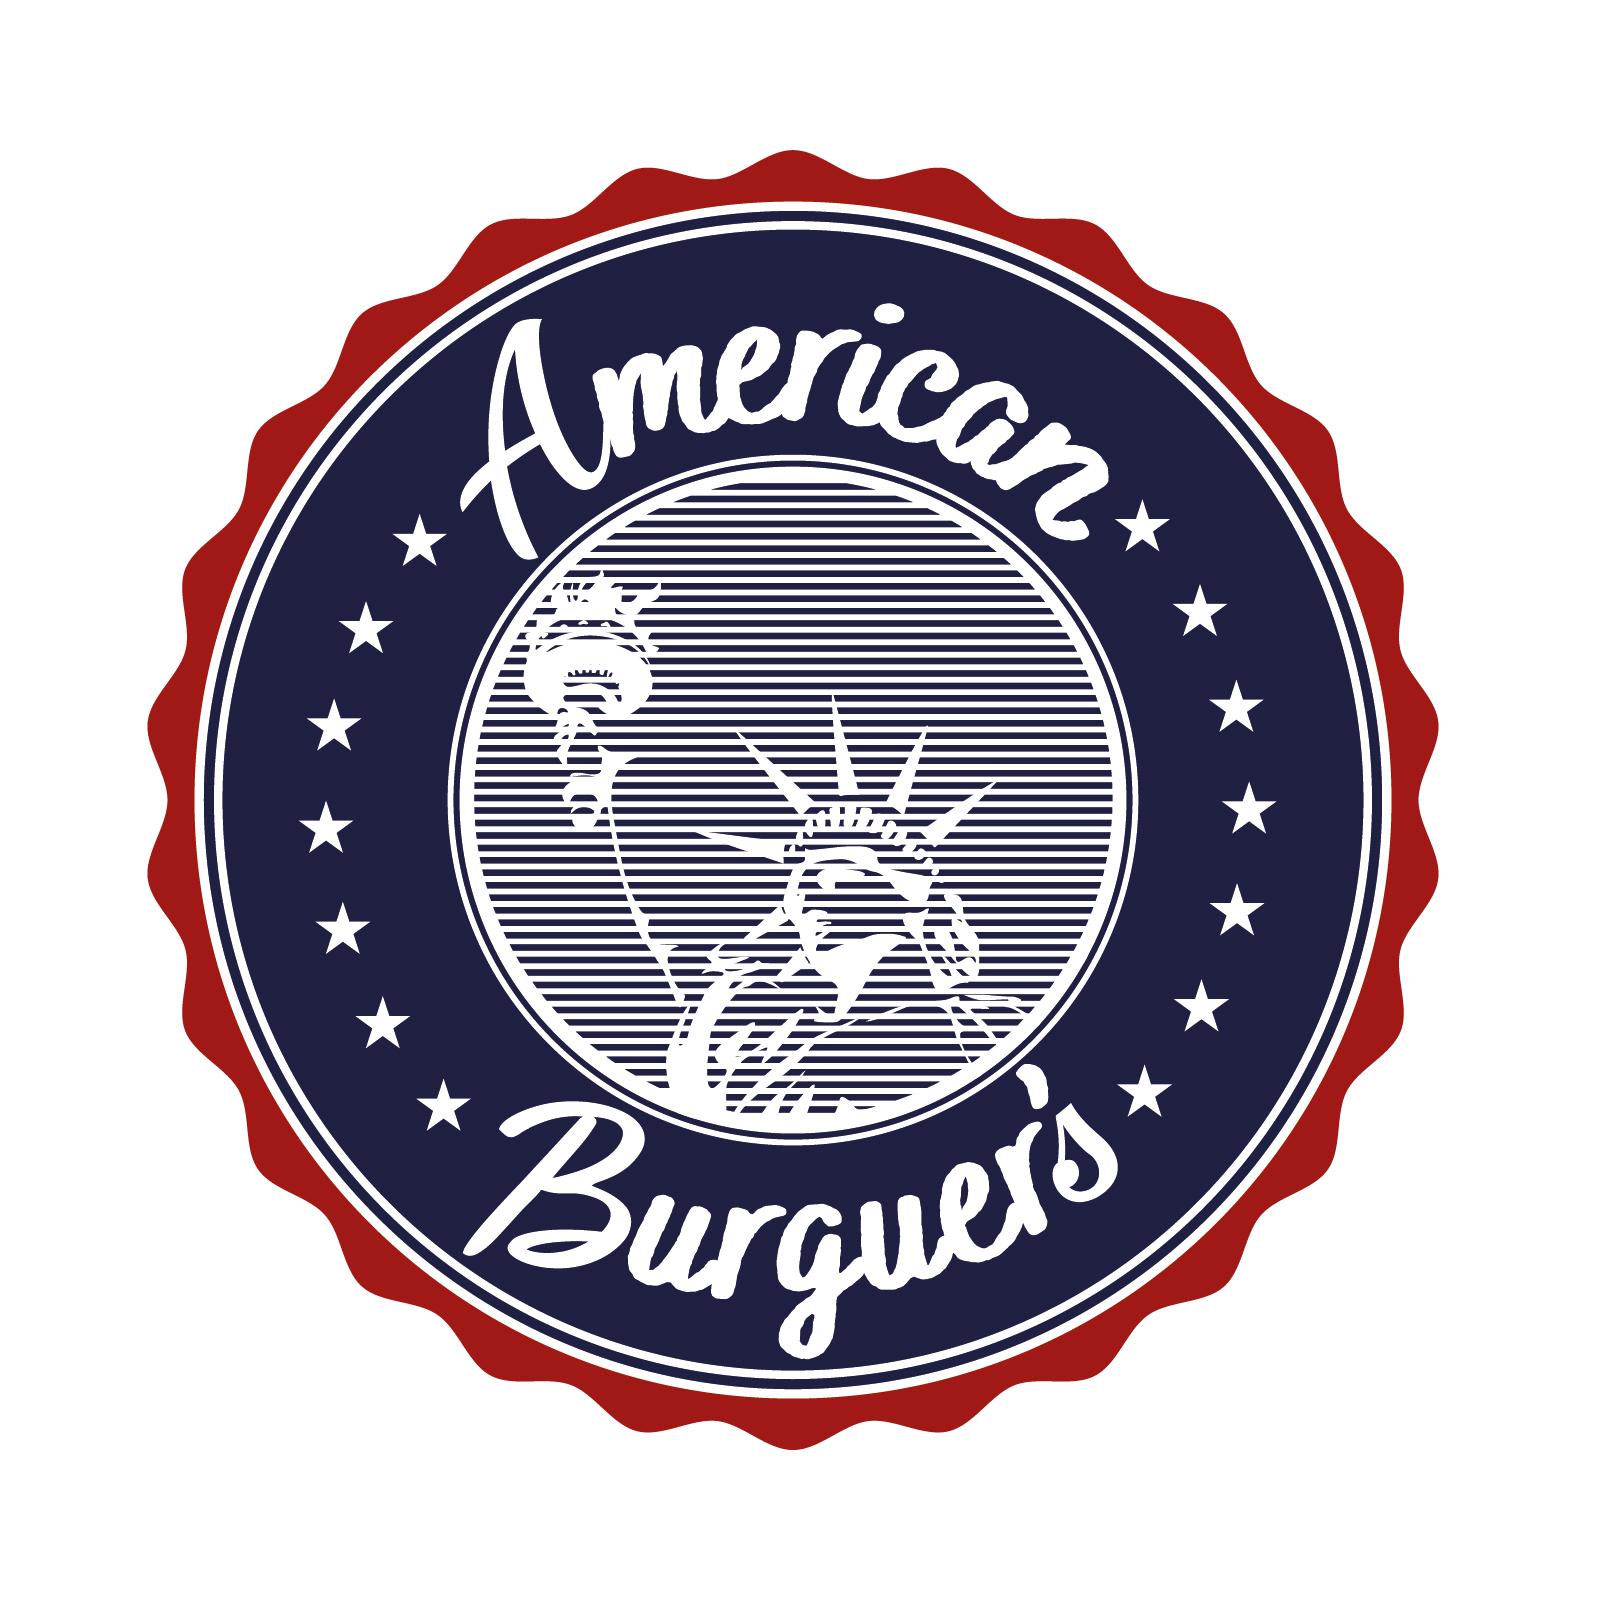 American Burguer's